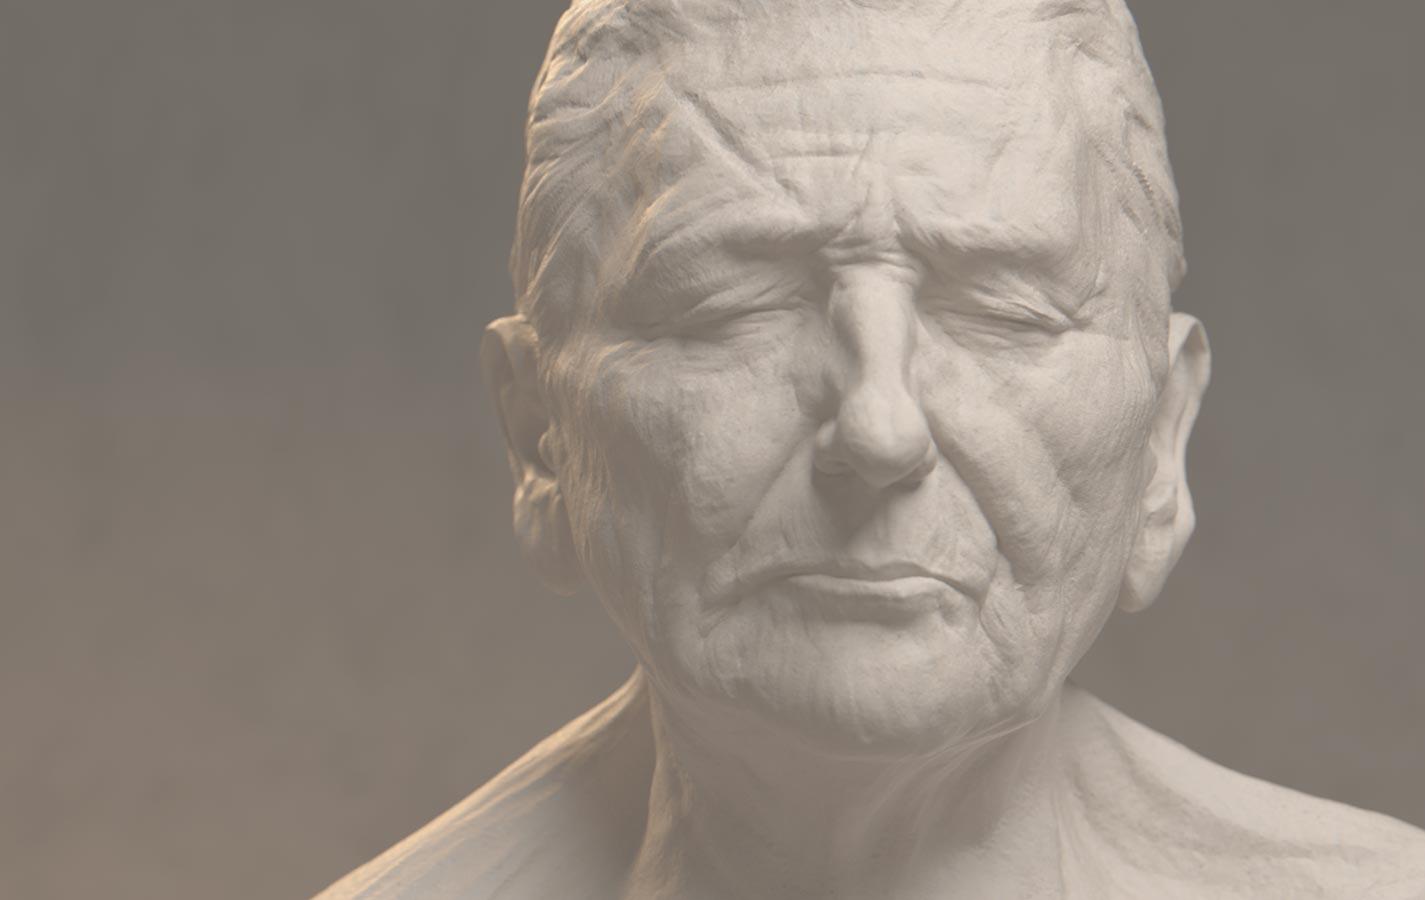 Ismael Fuentes: El escultor hiperrealista en 3D